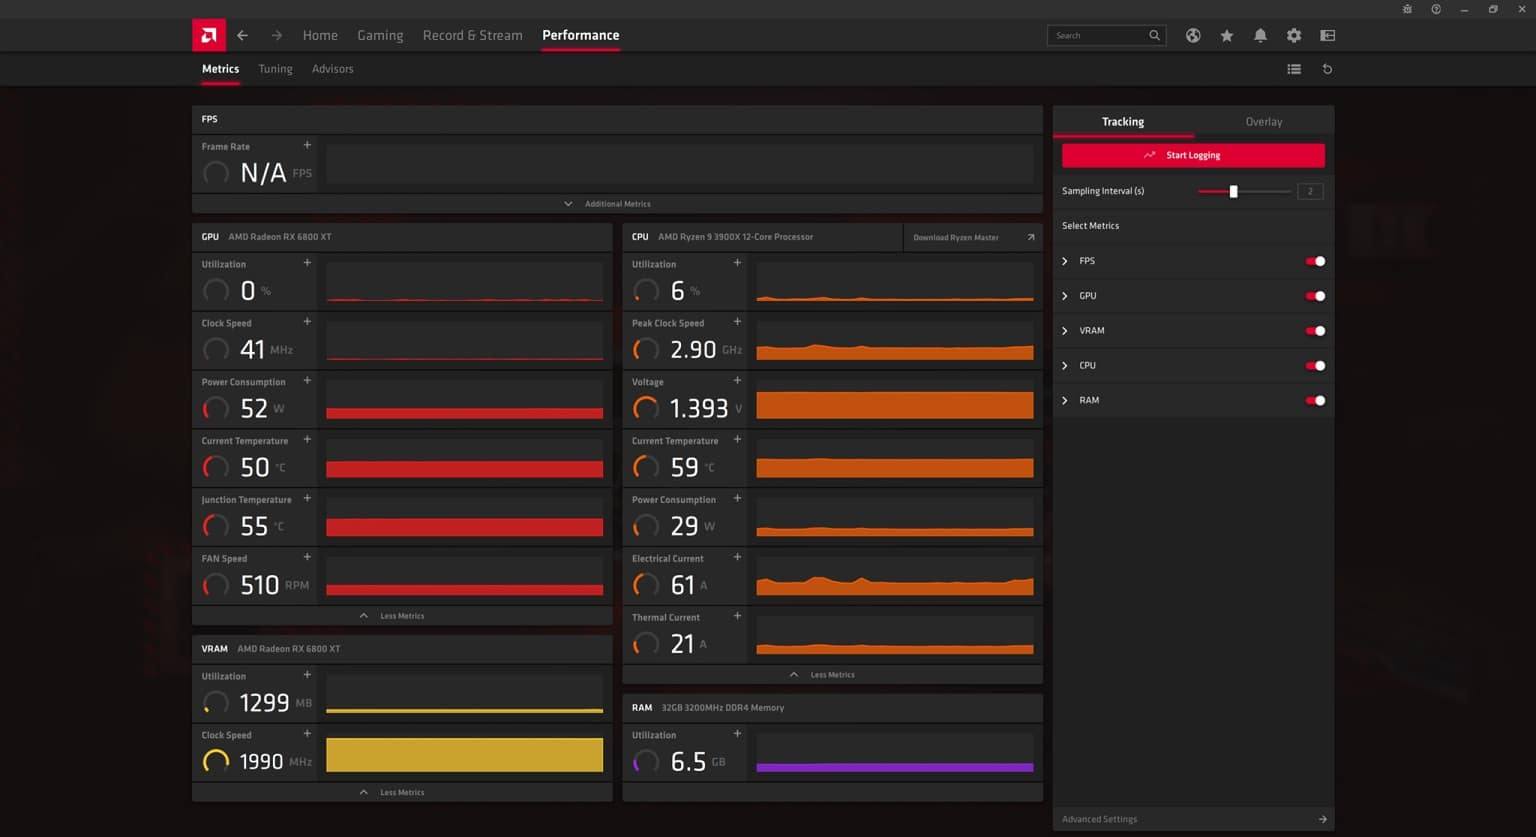 AMD Radeon Software Adrenalin 21.4.1,Performance, GamersRD